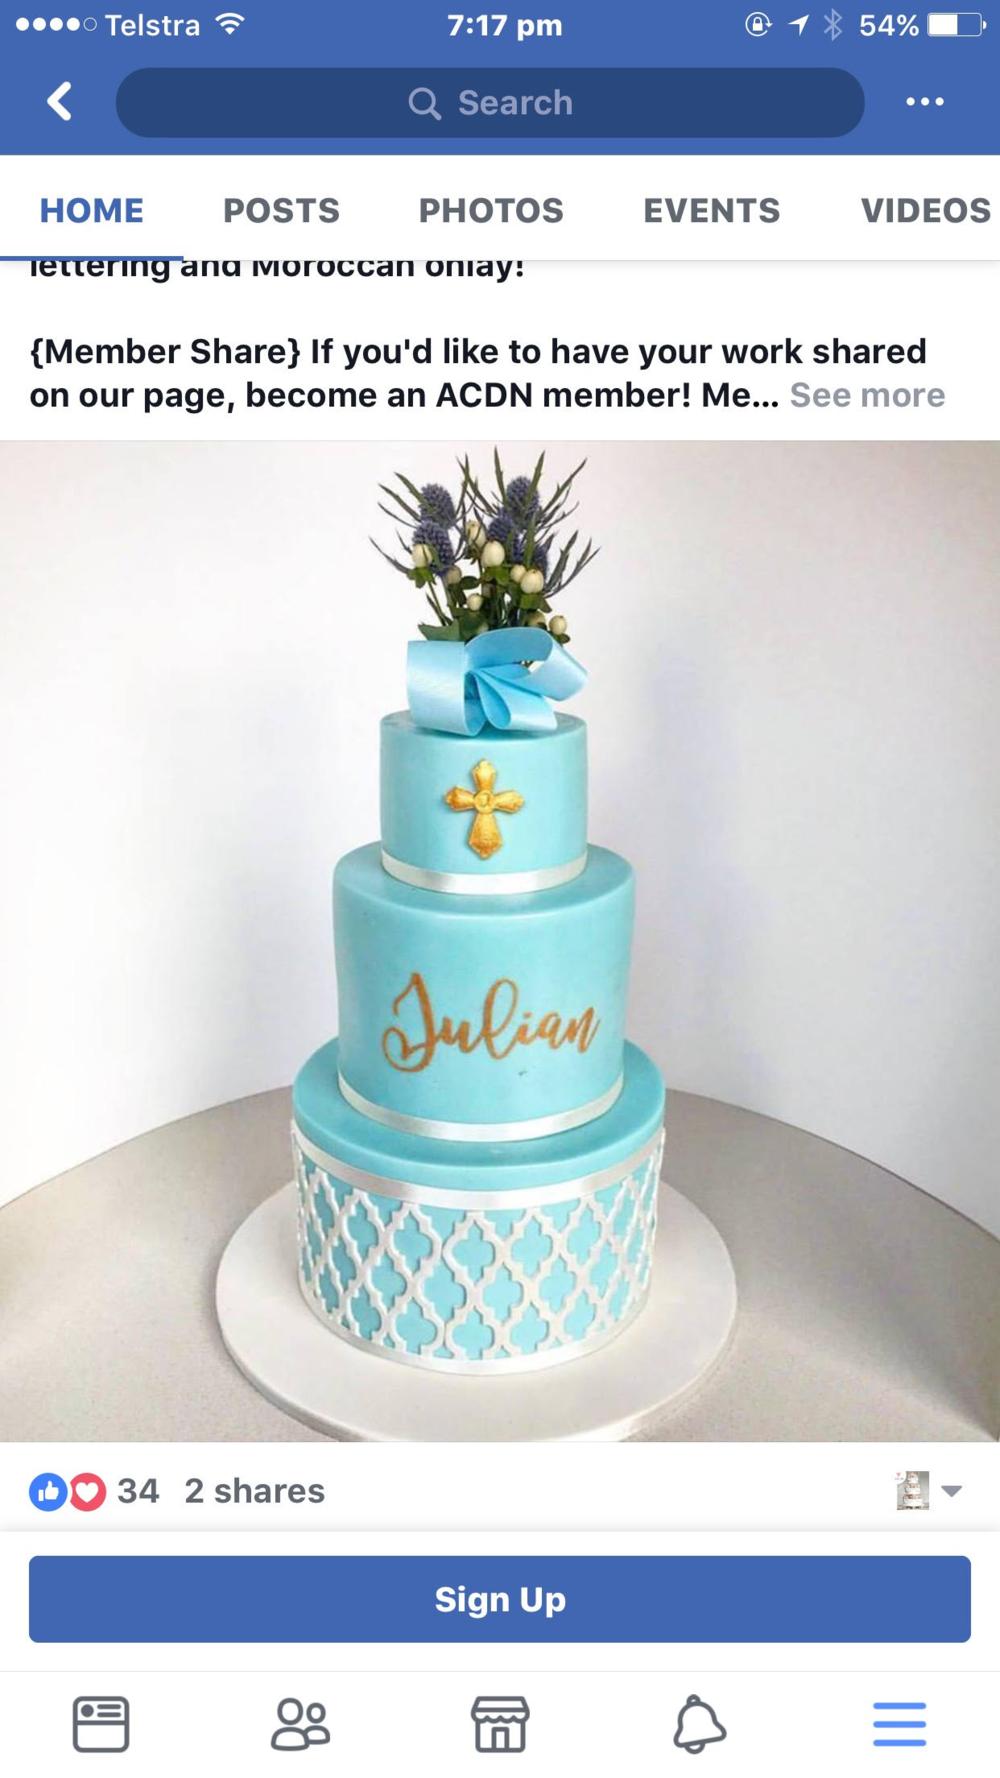 Julian cake pic.png